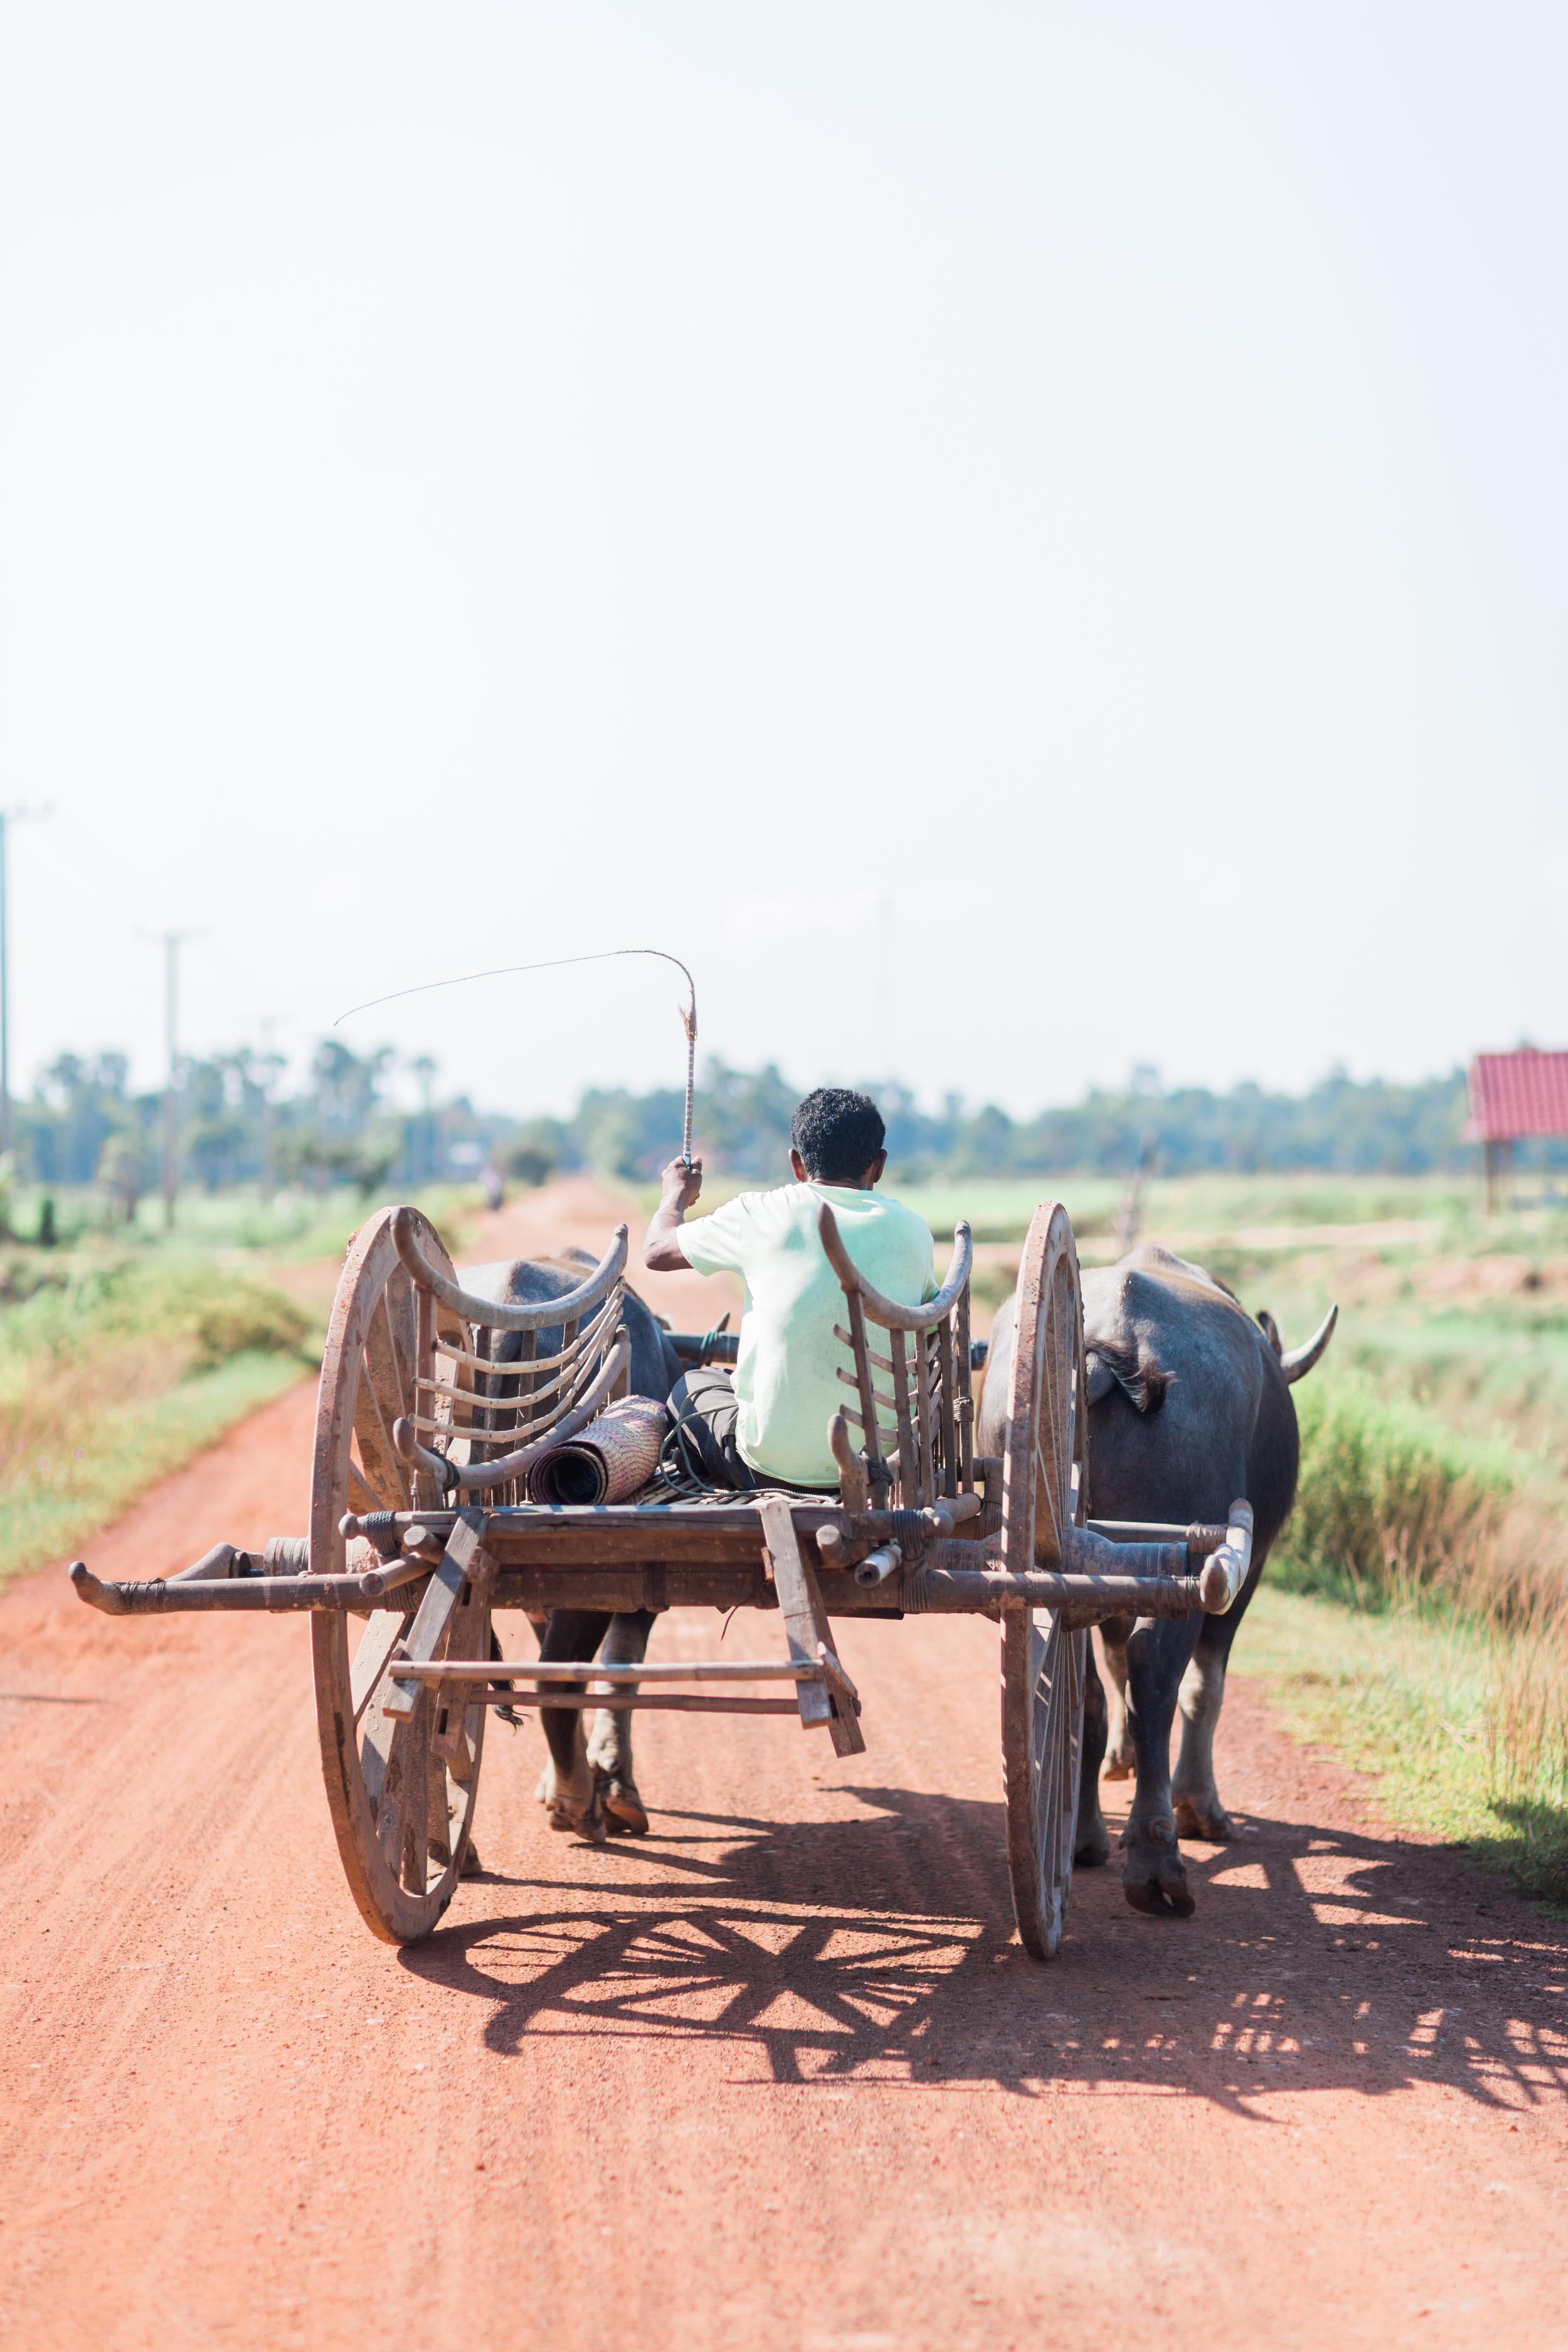 Cari Zhu Photography - Cambodia Siem Reap South East Asia Travel-1596.jpg